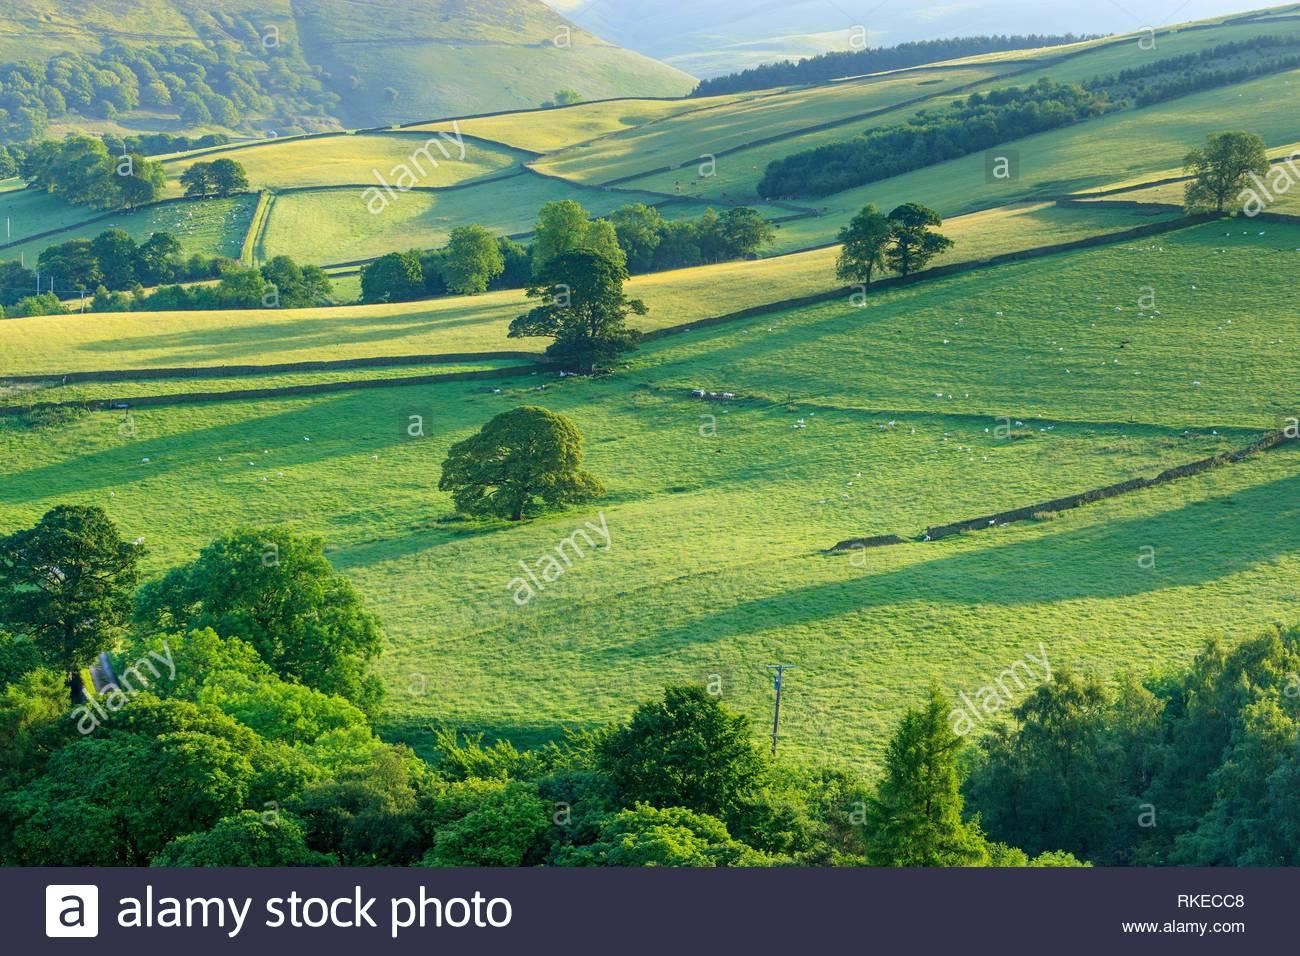 Hayfield High Peak Derbyshire England. - Stock Image